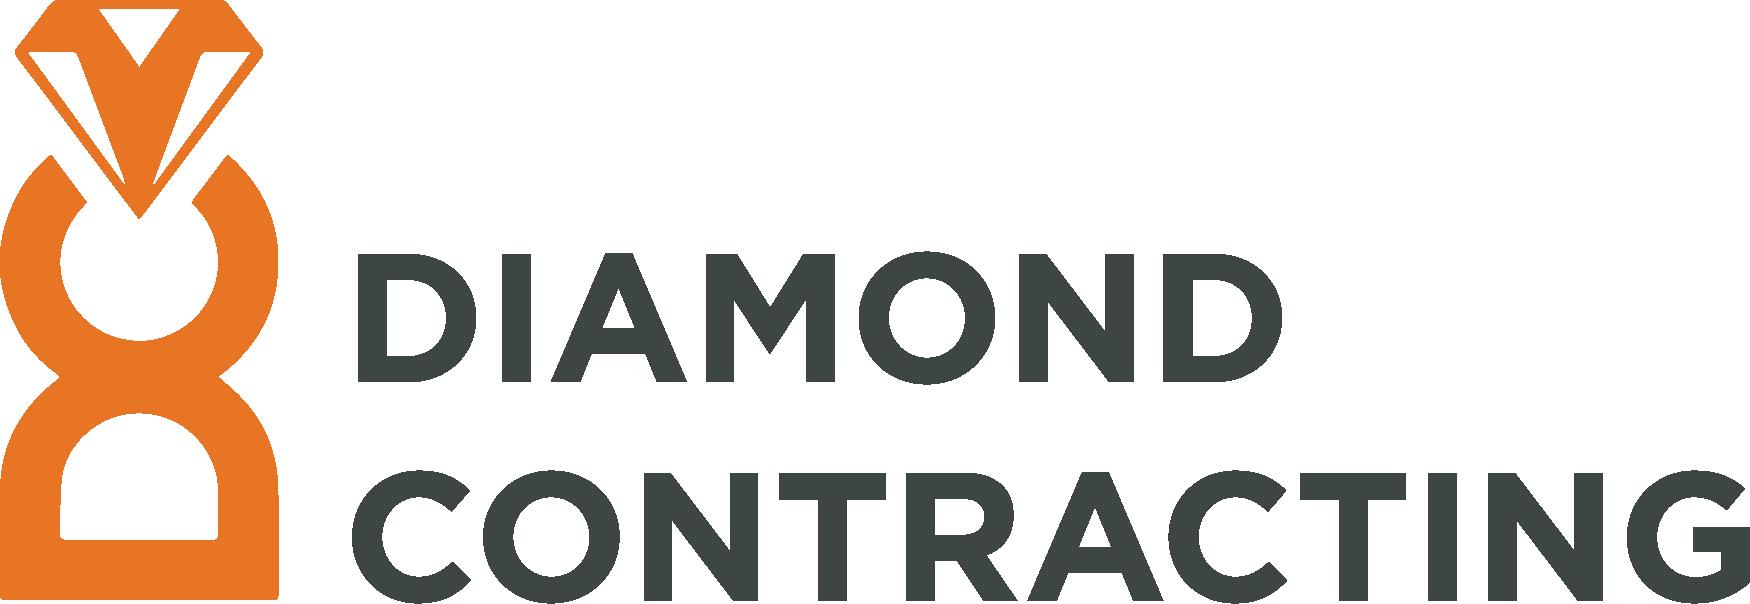 DiamondContracting_Logo_COLOUR.png